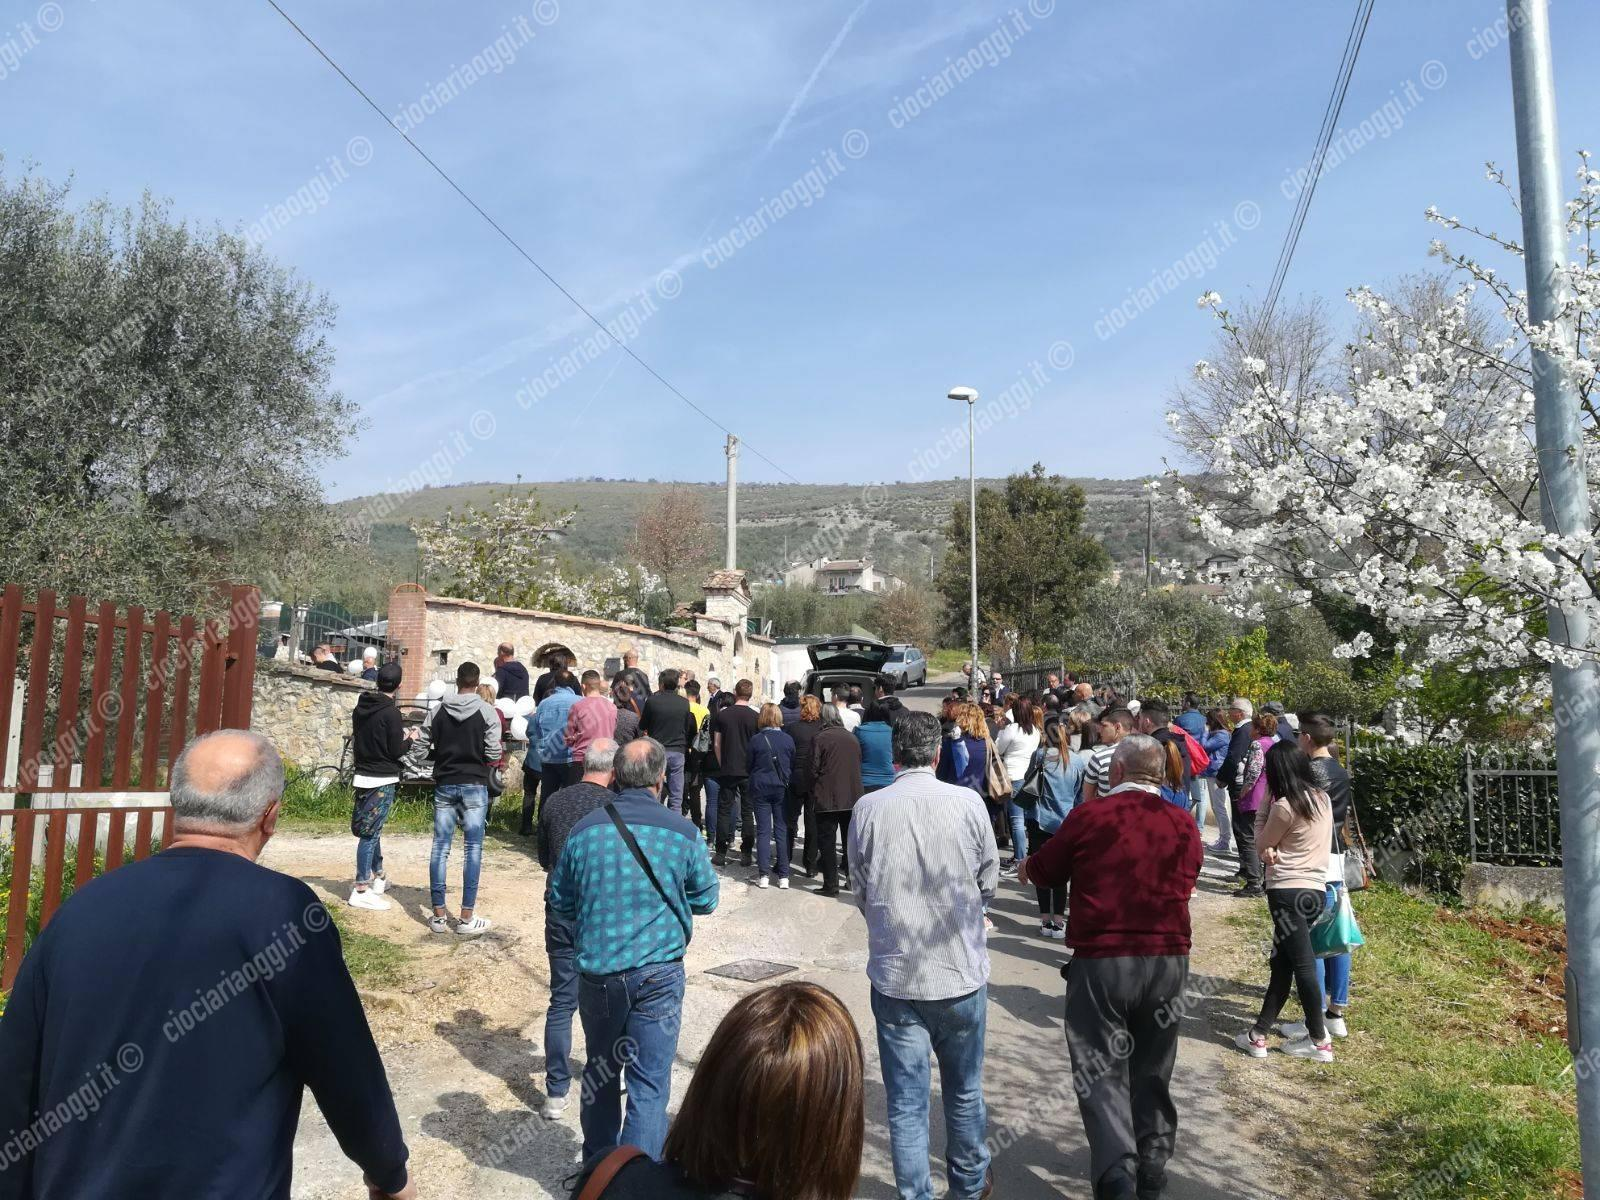 Alatri, folla commossa ai funerali di Emanuele: